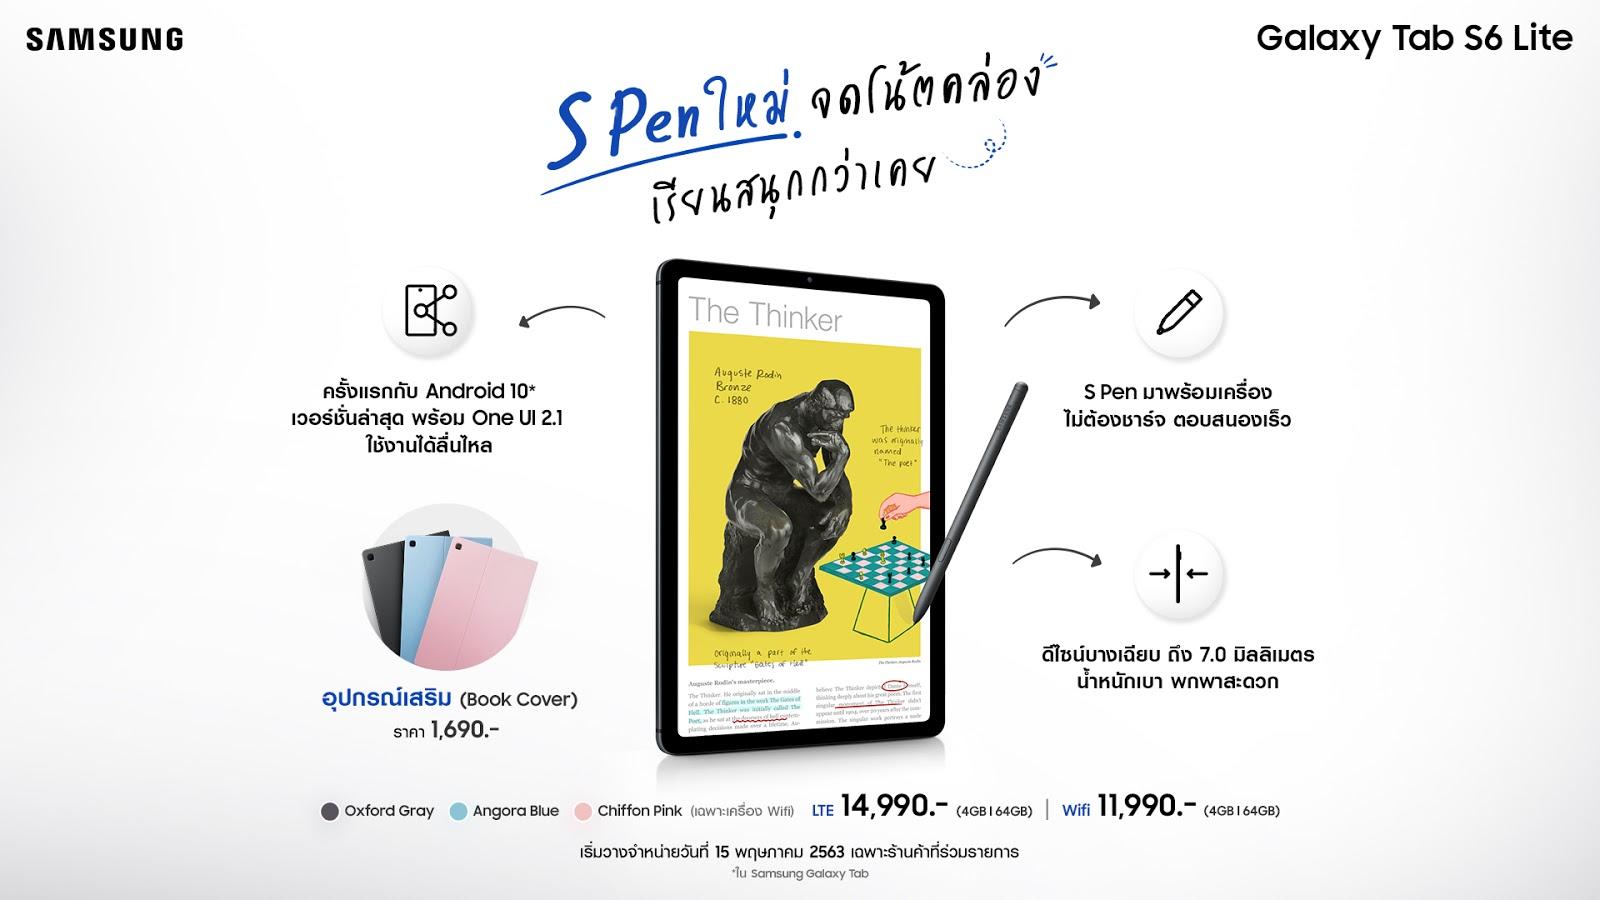 "Samsung ส่งแท็บเล็ตรุ่นเล็กสเปคจัดเต็ม ""Galaxy Tab S6 Lite""  มาพร้อม S Pen ใหม่ จดโน้ตคล่อง เรียนสนุกกว่าที่เคย"